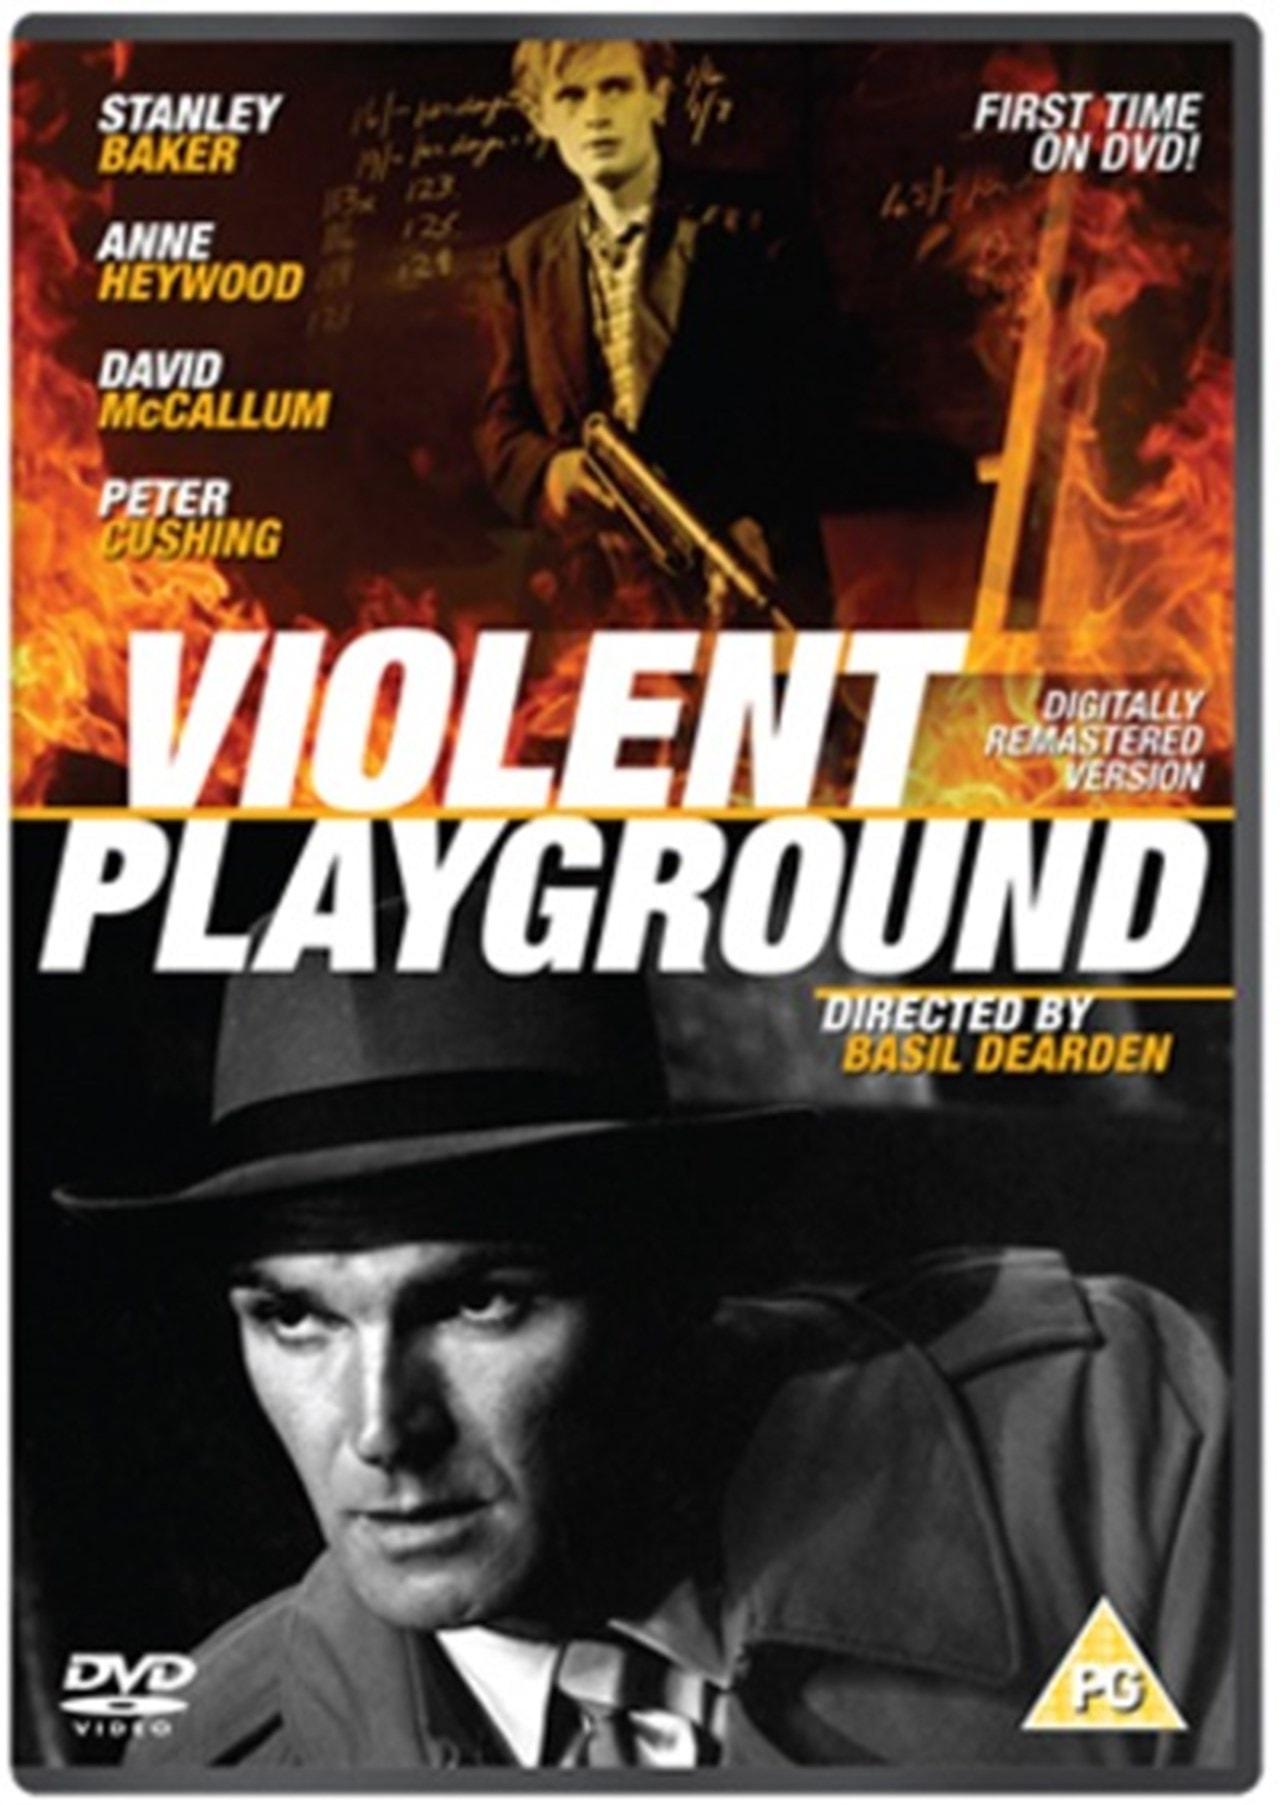 Violent Playground - 1